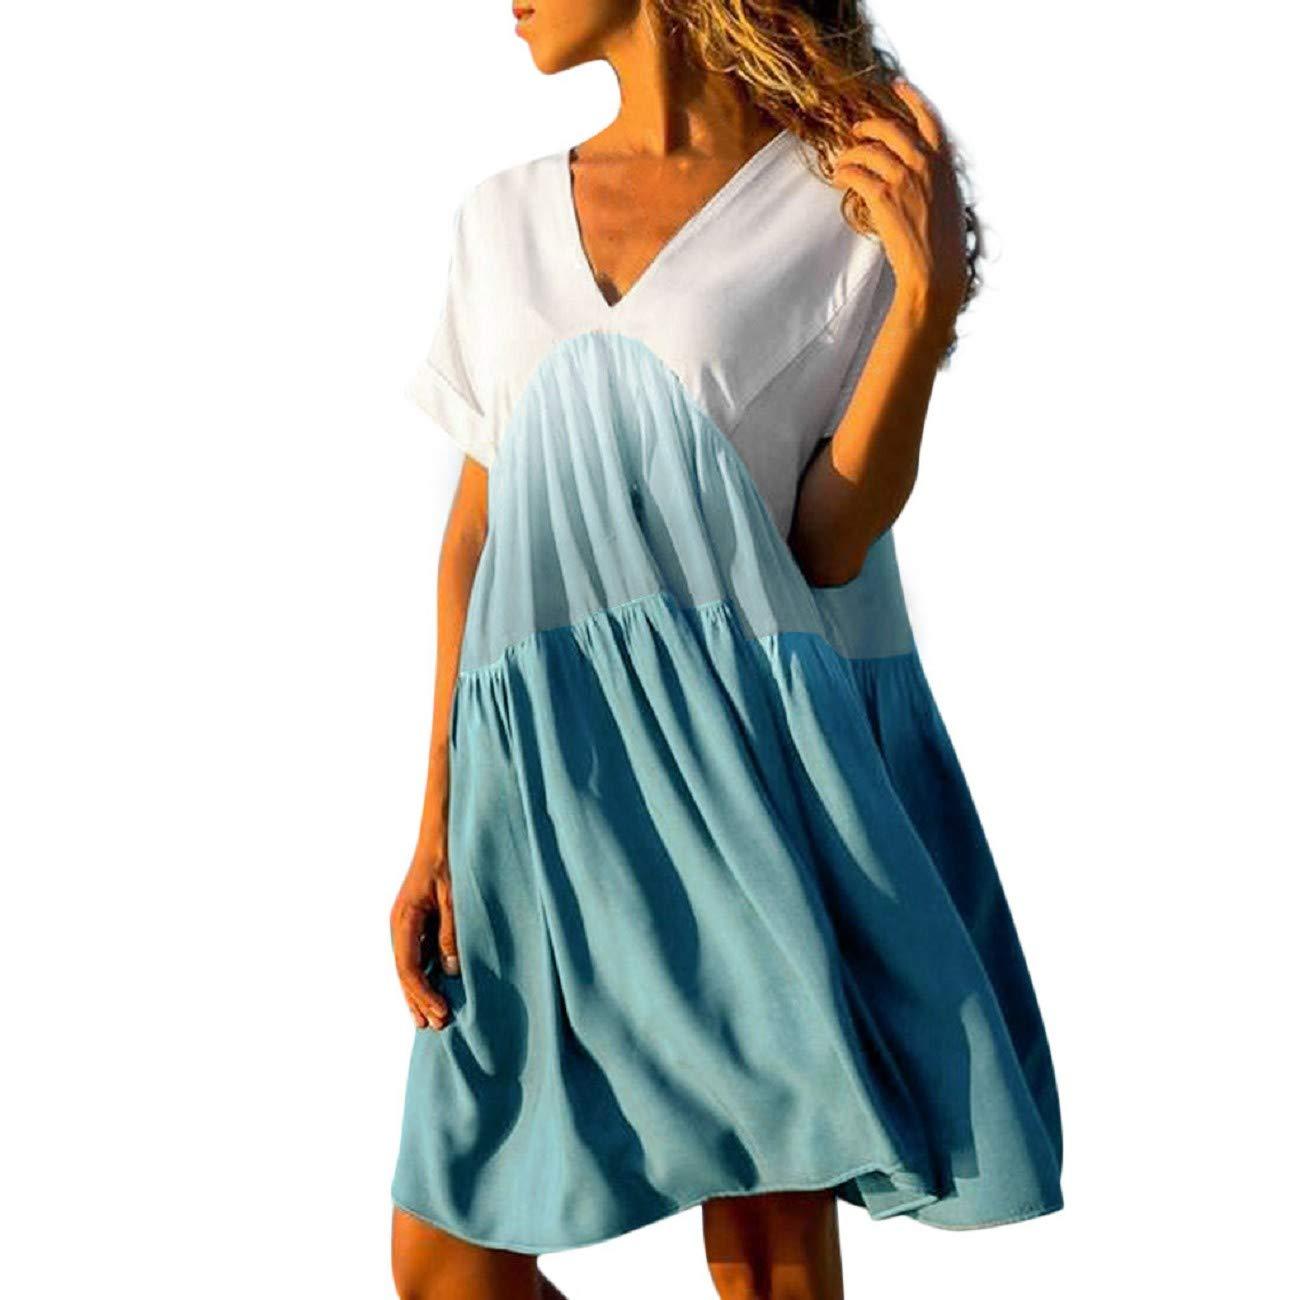 Womens Casual Short Dress Patchwork Gradient Color V-Neck Short Sleeve Mini Dress Ruffled Loose Swing Dress by FAPIZI Blue